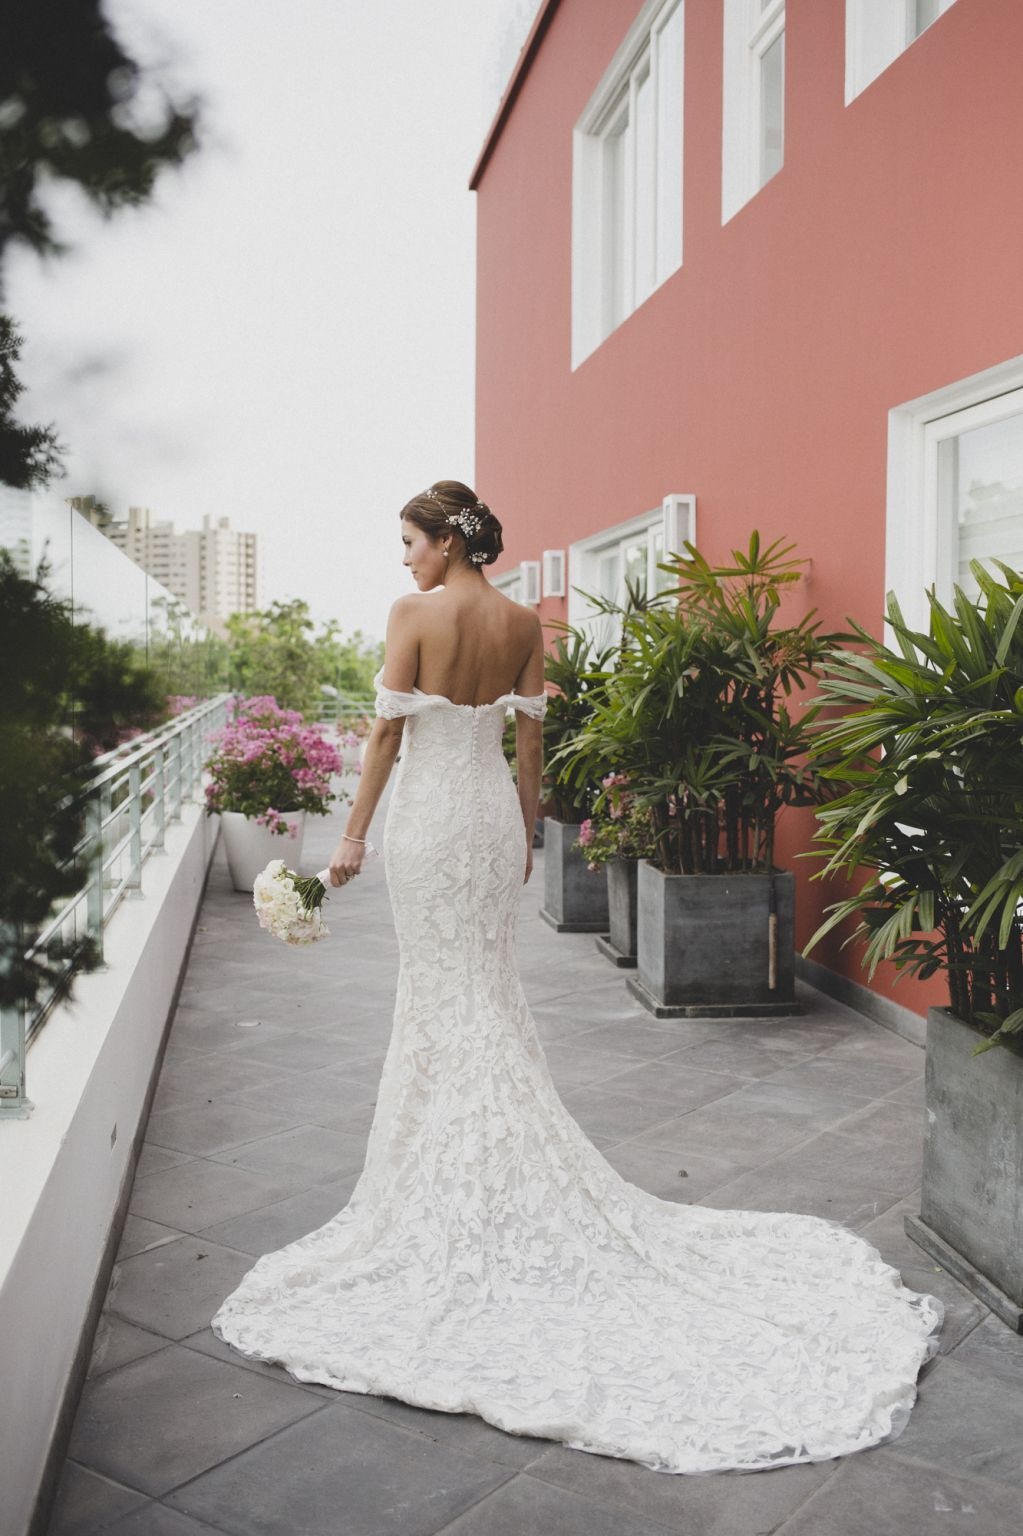 Pronovias Rani Atelier Pronovias Wedding Dress Used Size 0